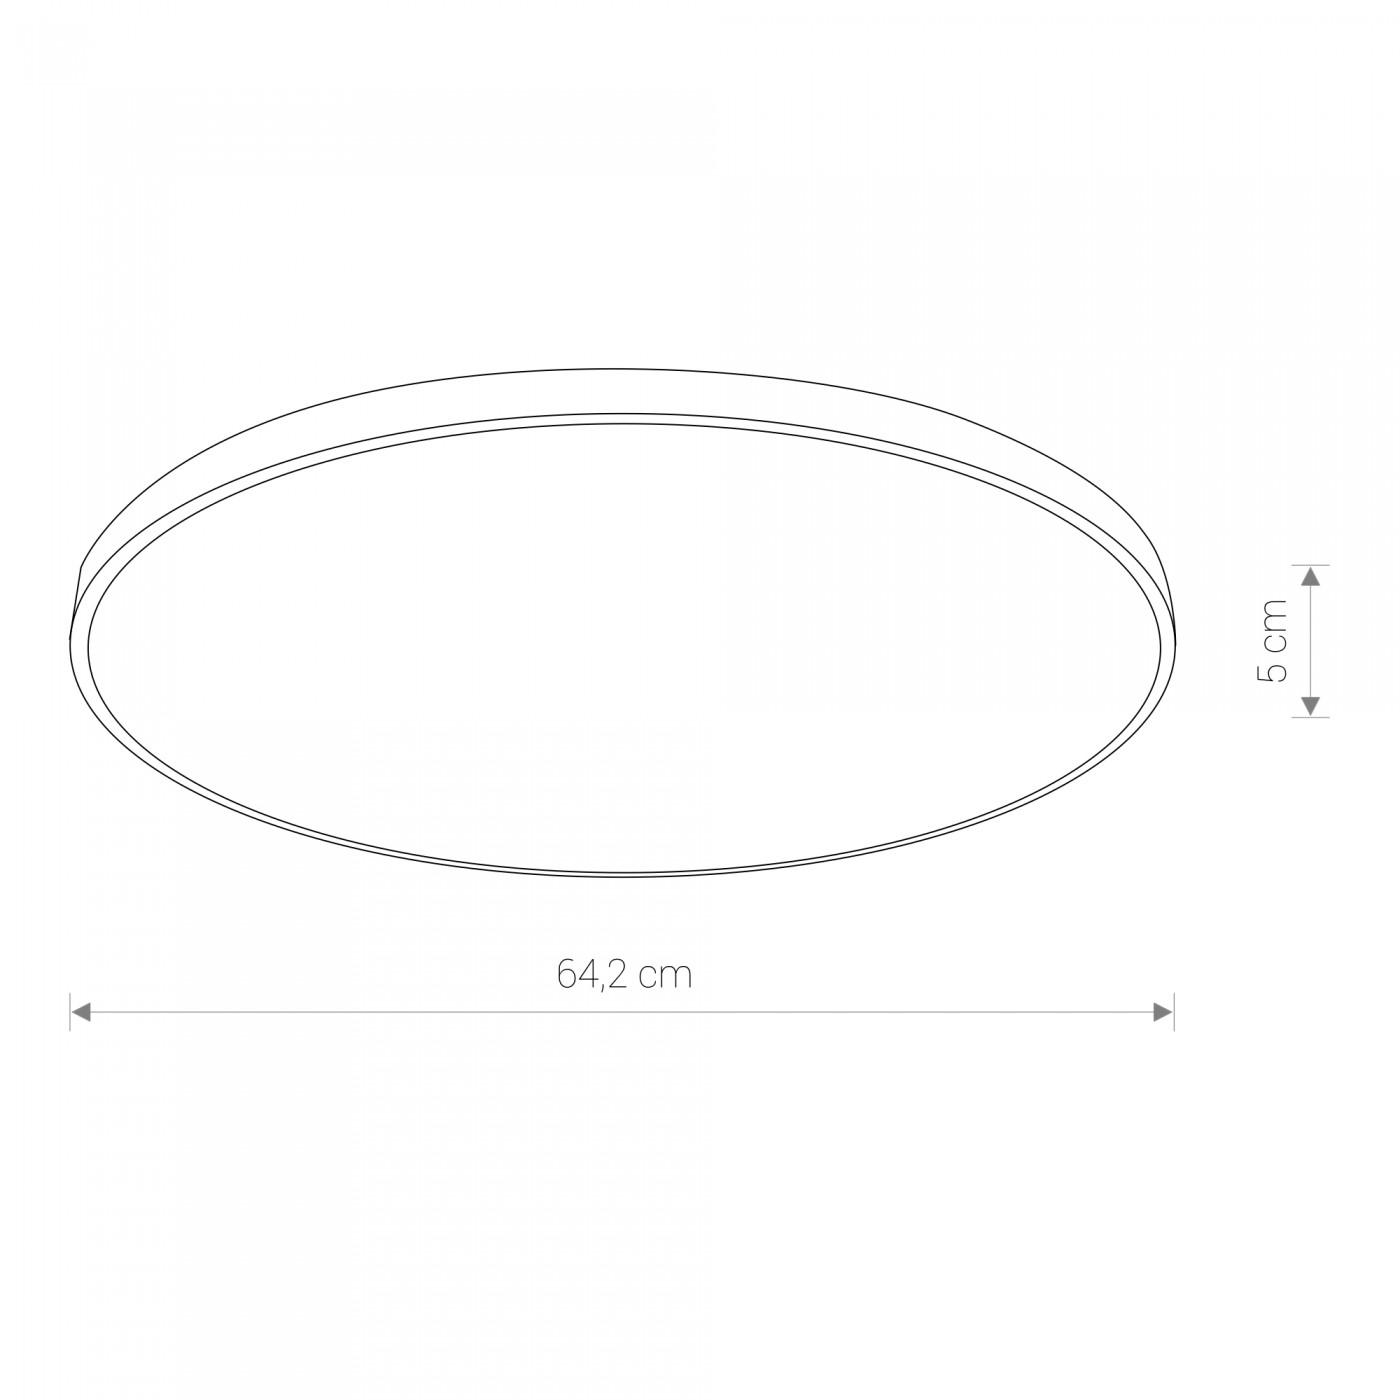 Nowodvorski TL-8206 Agnes Round LED víz-védett mennyezeti lámpa